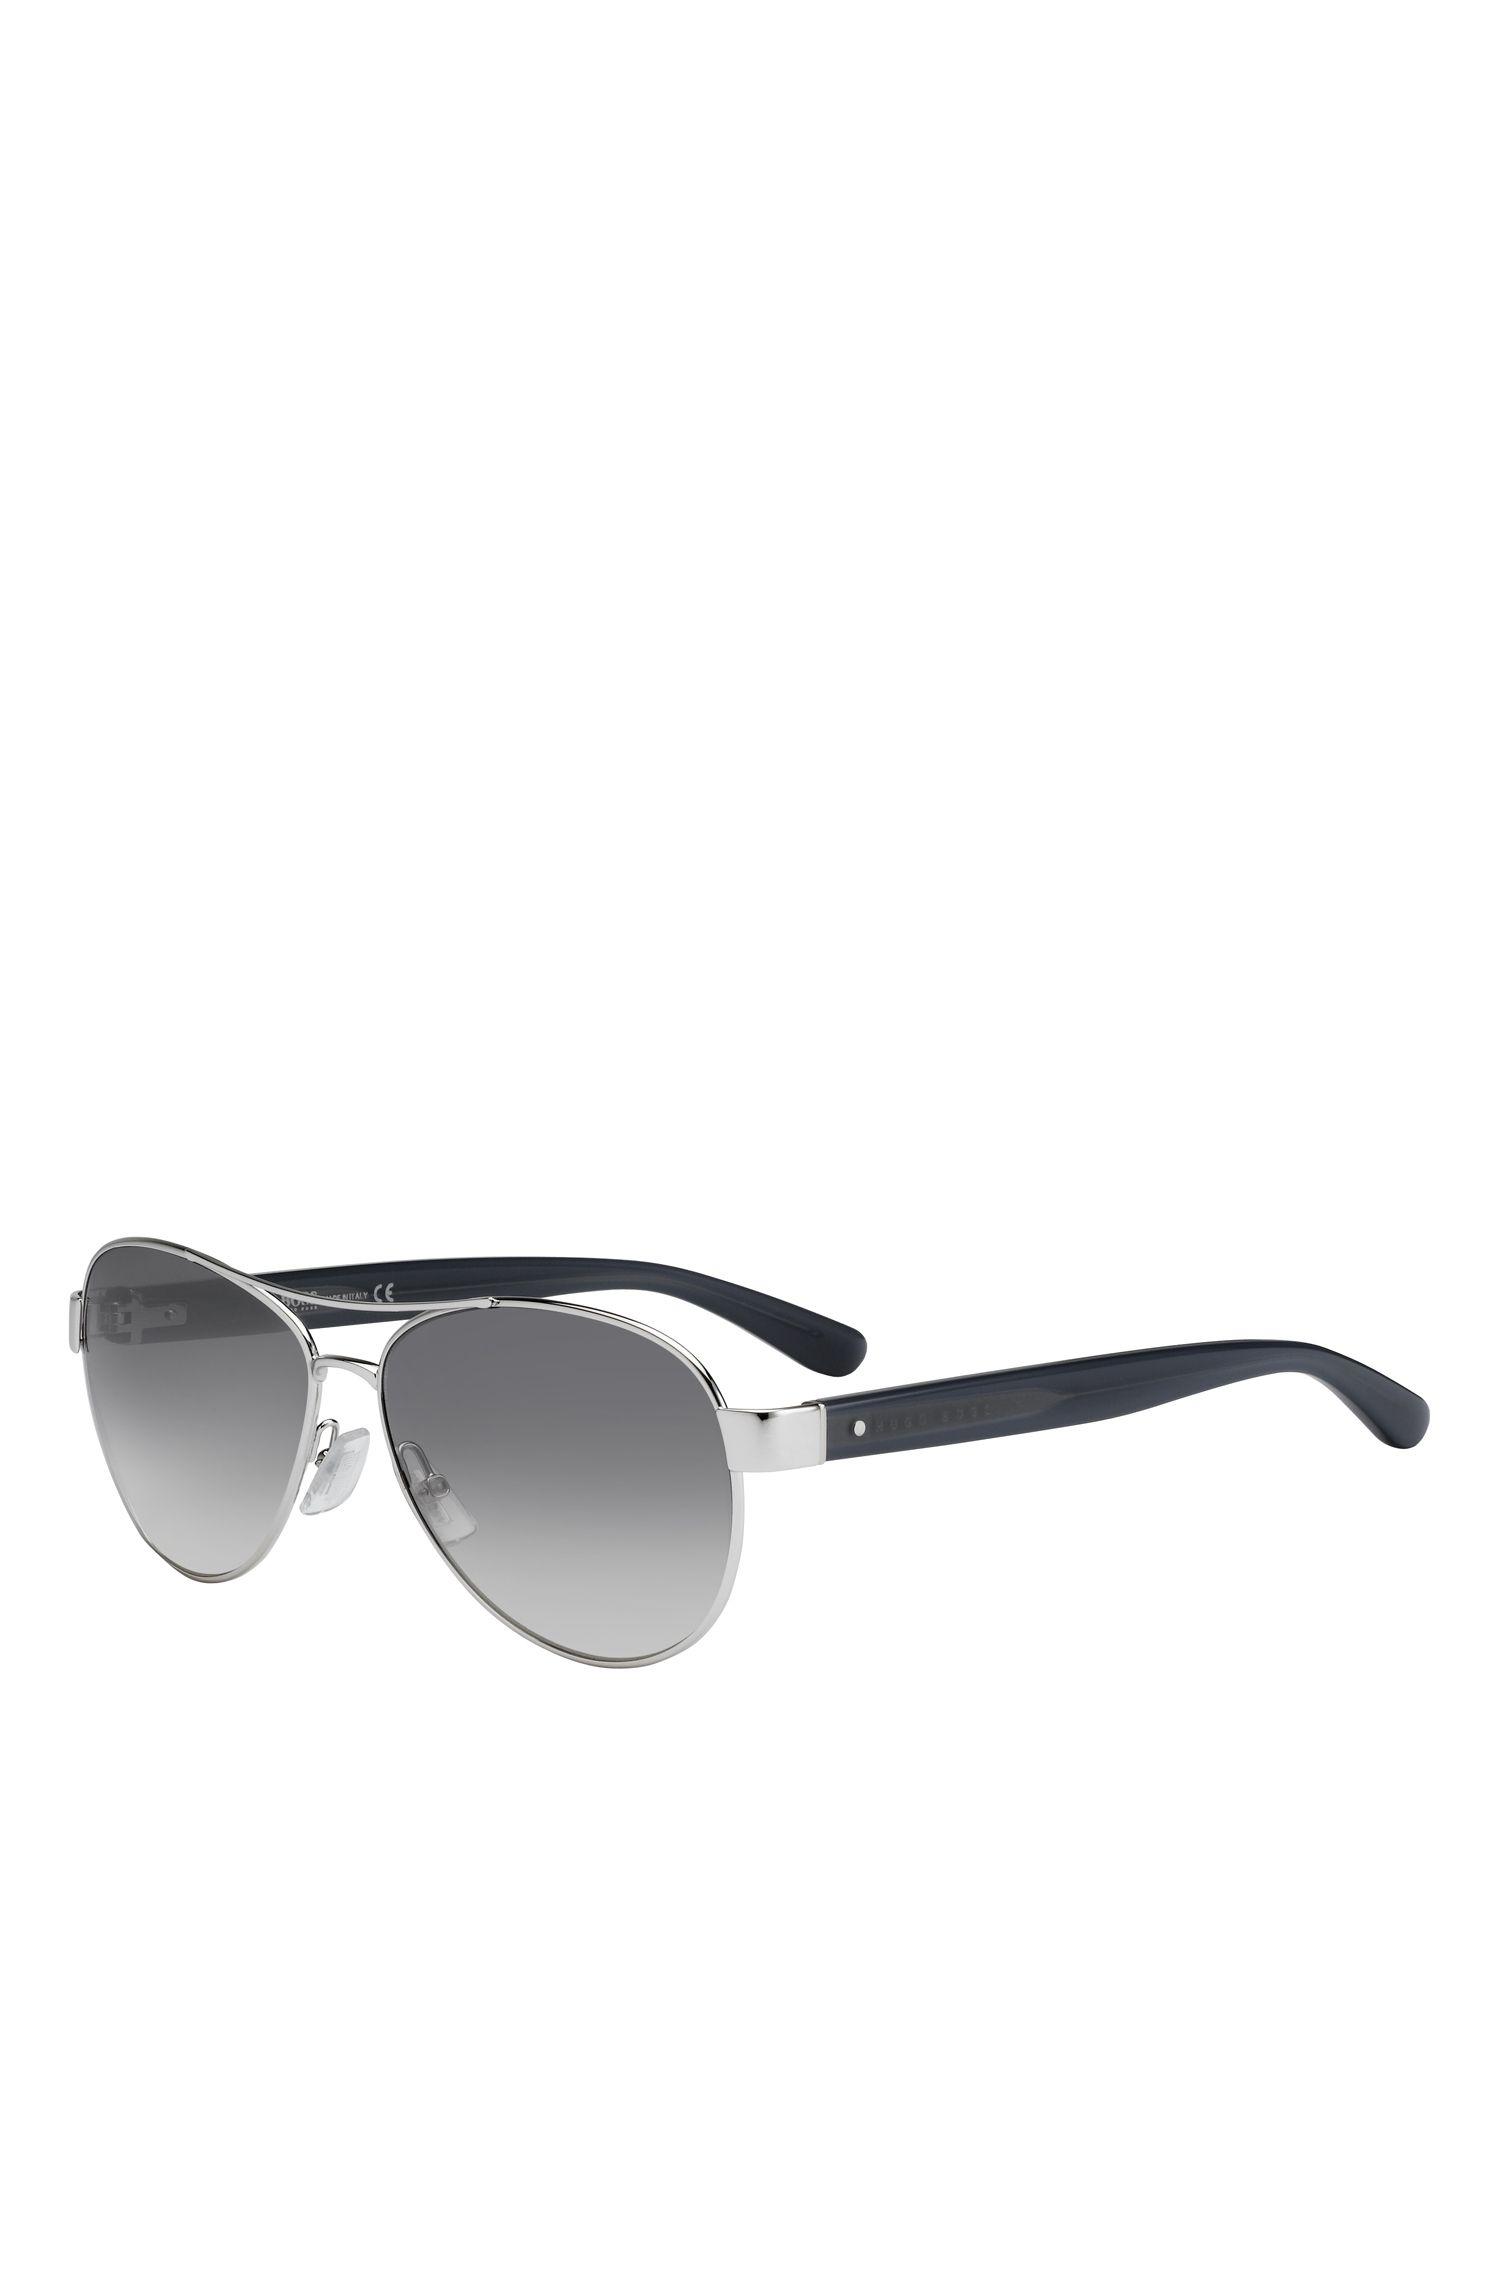 'BOSS 0788S' | Mirror Lens Aviator Sunglasses